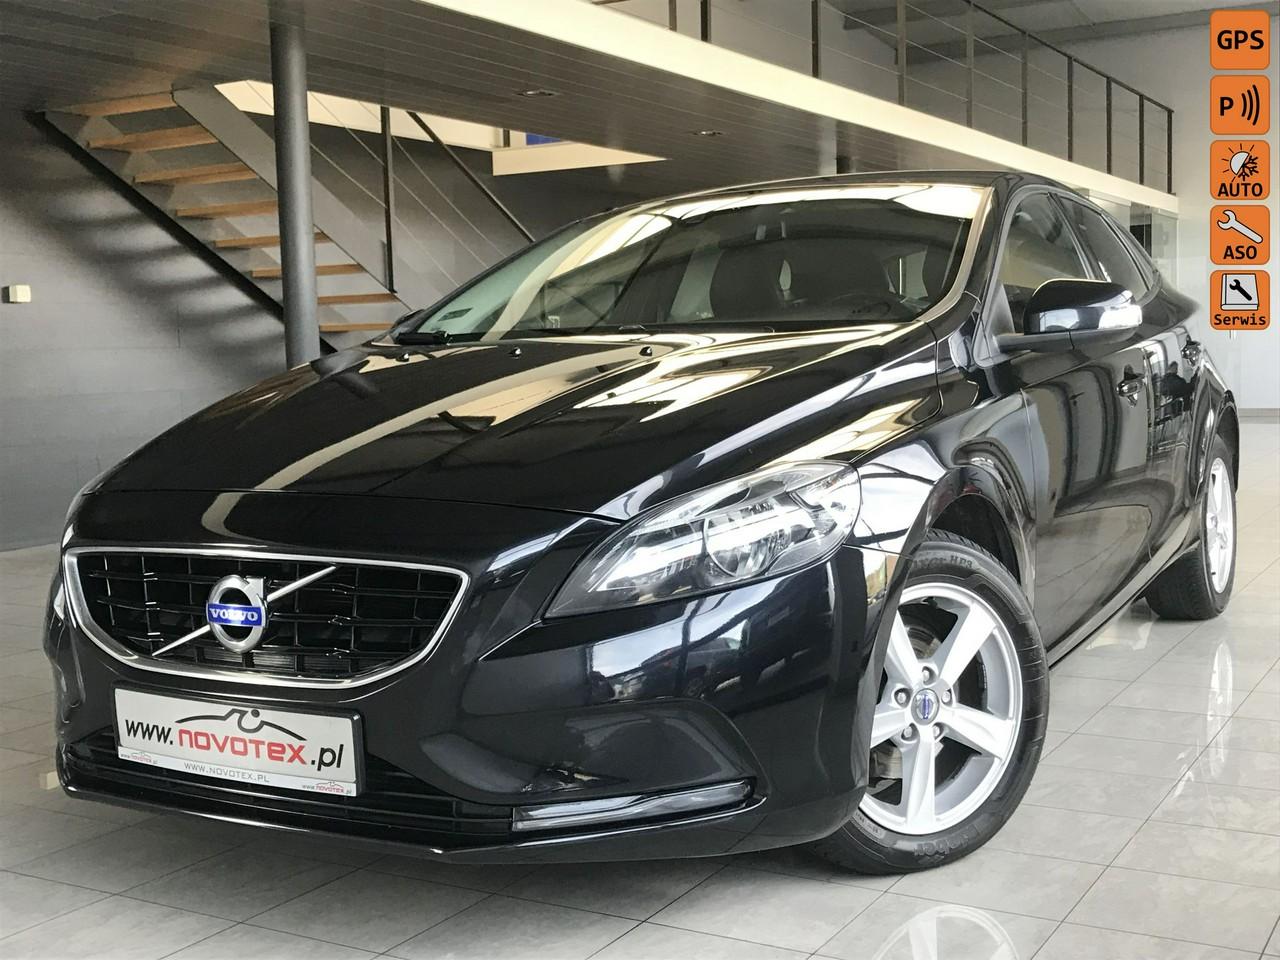 Volvo V40 D2*Momentum*navi*serwis w ASO*Gwarancja VIP Service*zarejestrowany